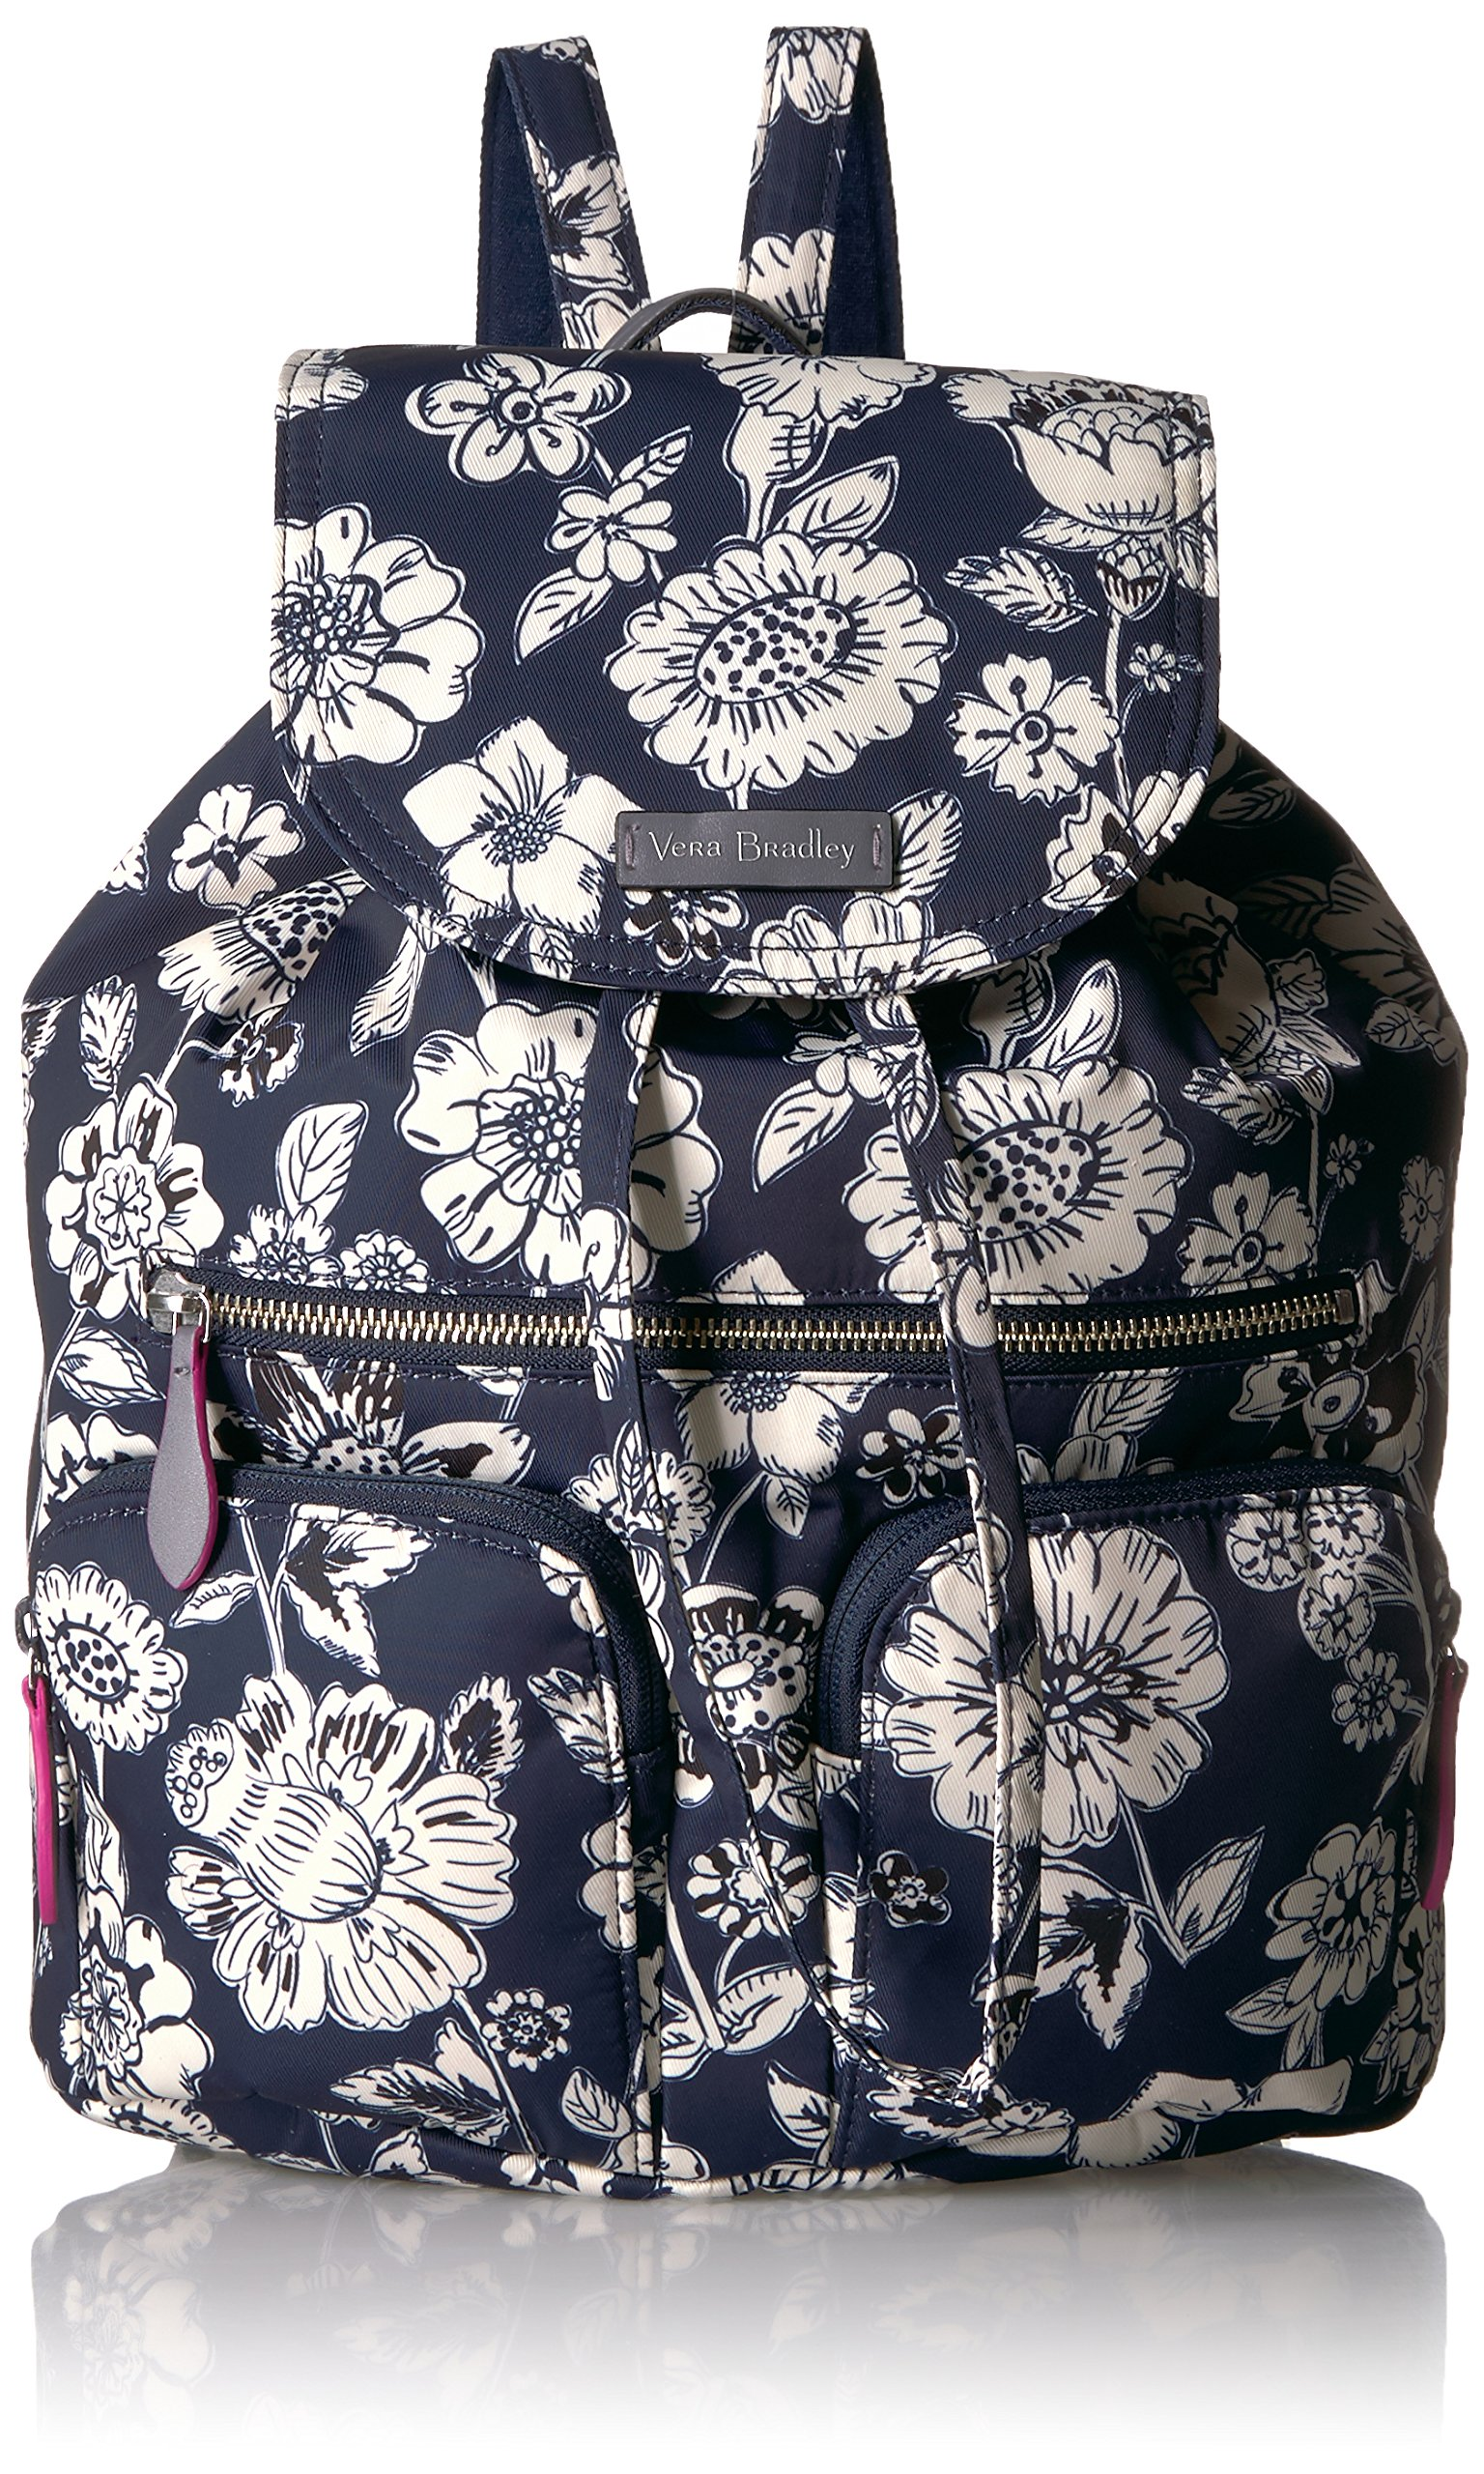 Vera Bradley Women's Midtown Cargo Backpack, midnight floral by Vera Bradley